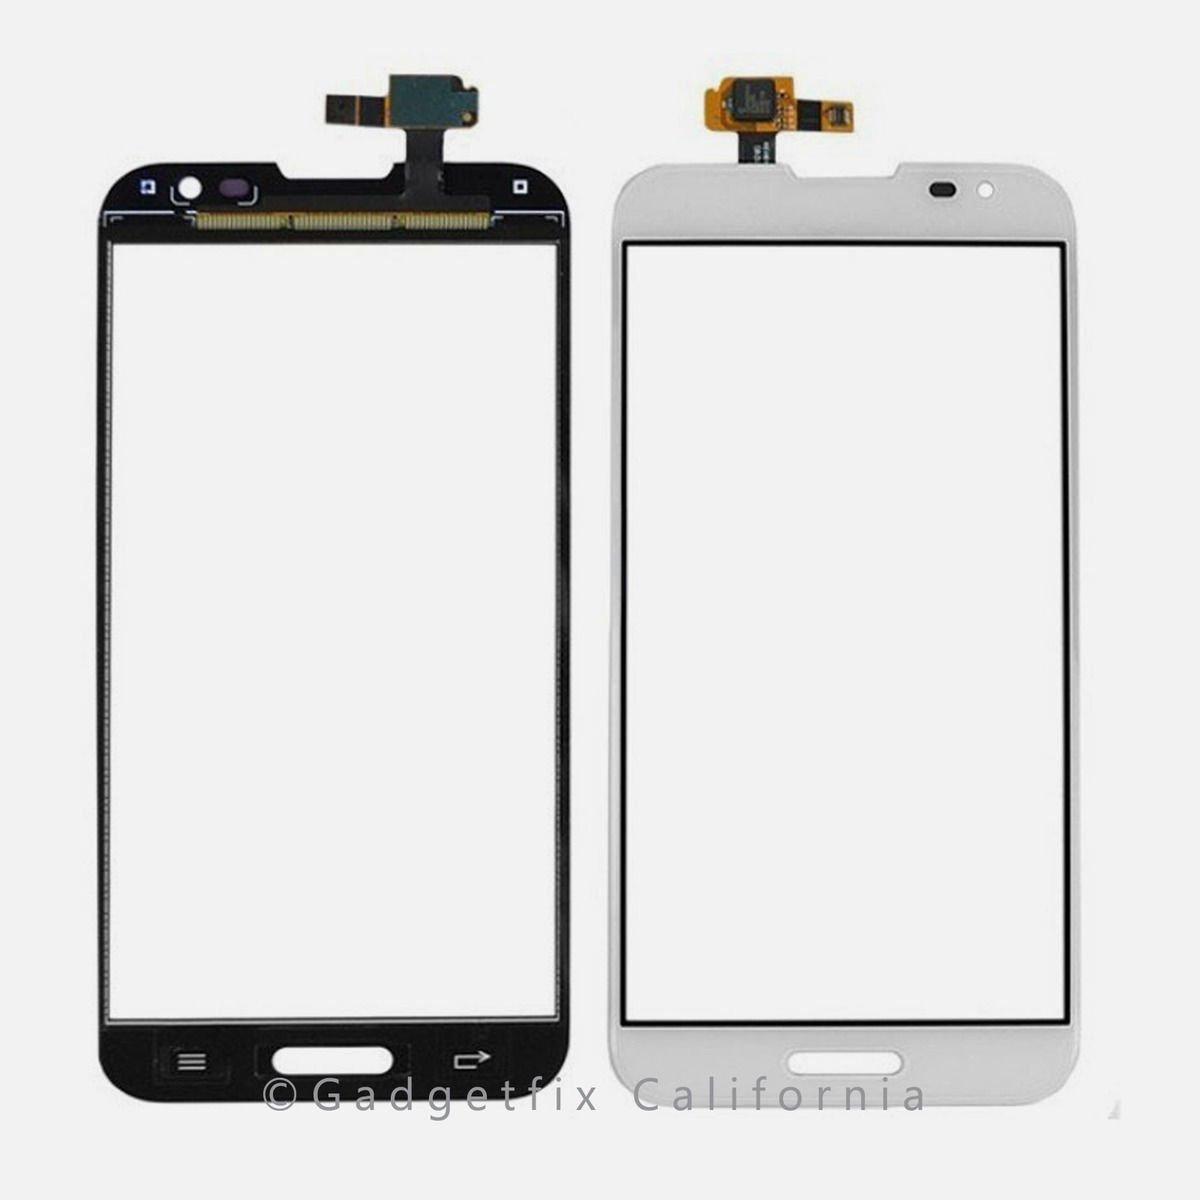 LG Optimus G Pro E980 E985 F240 White Touch Panel Lens Digitizer Screen Parts